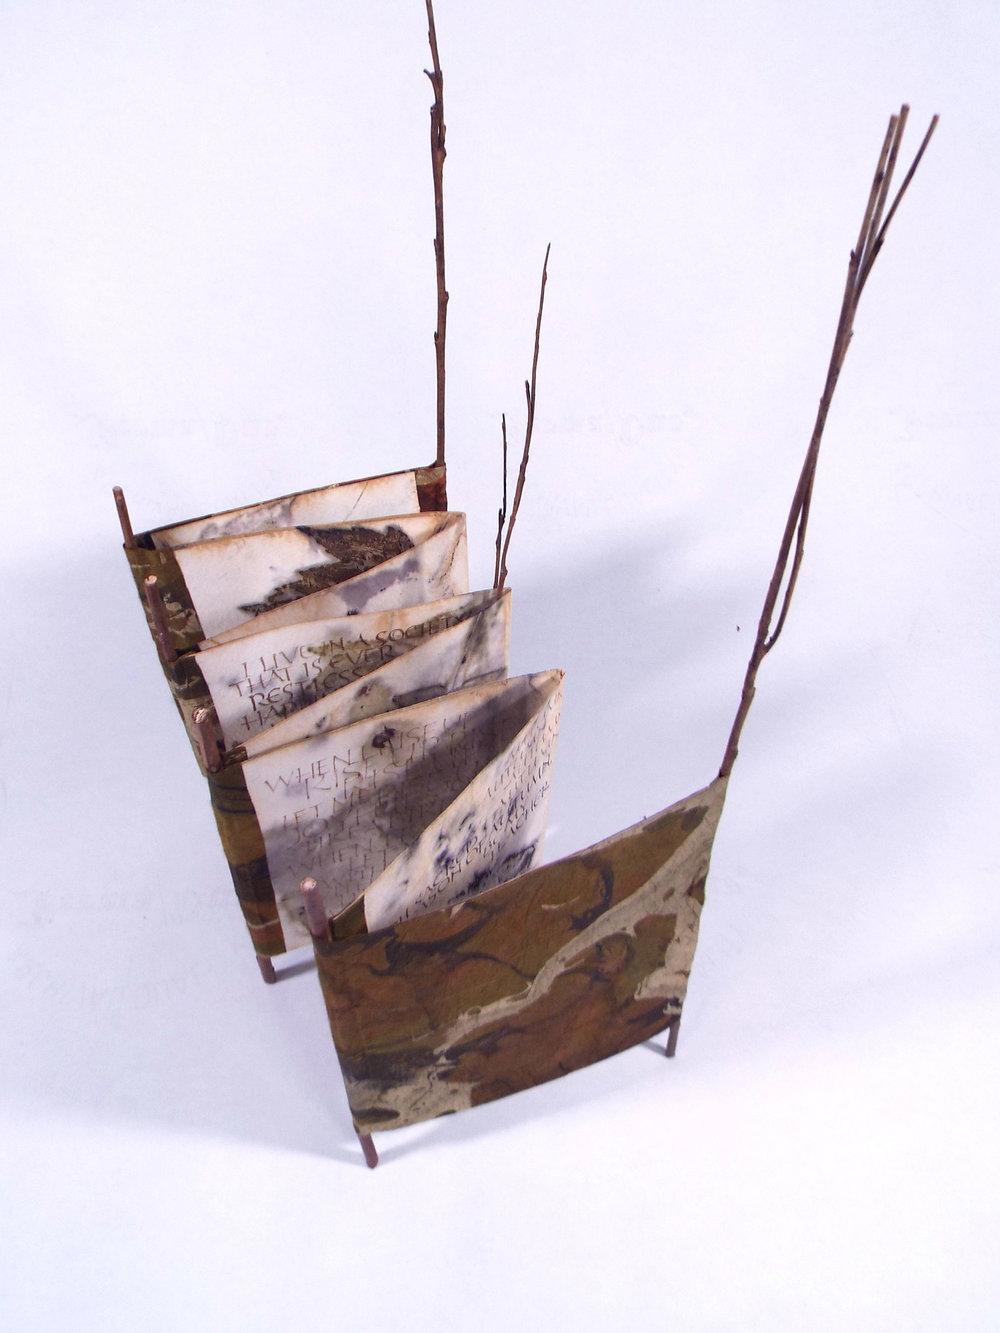 Christine Orsolini, Autumn Muse, walnut Ink, gold pigment on Eco-print paper, twigs, handmade paper, 2018, $125, Kalamazoo, MI